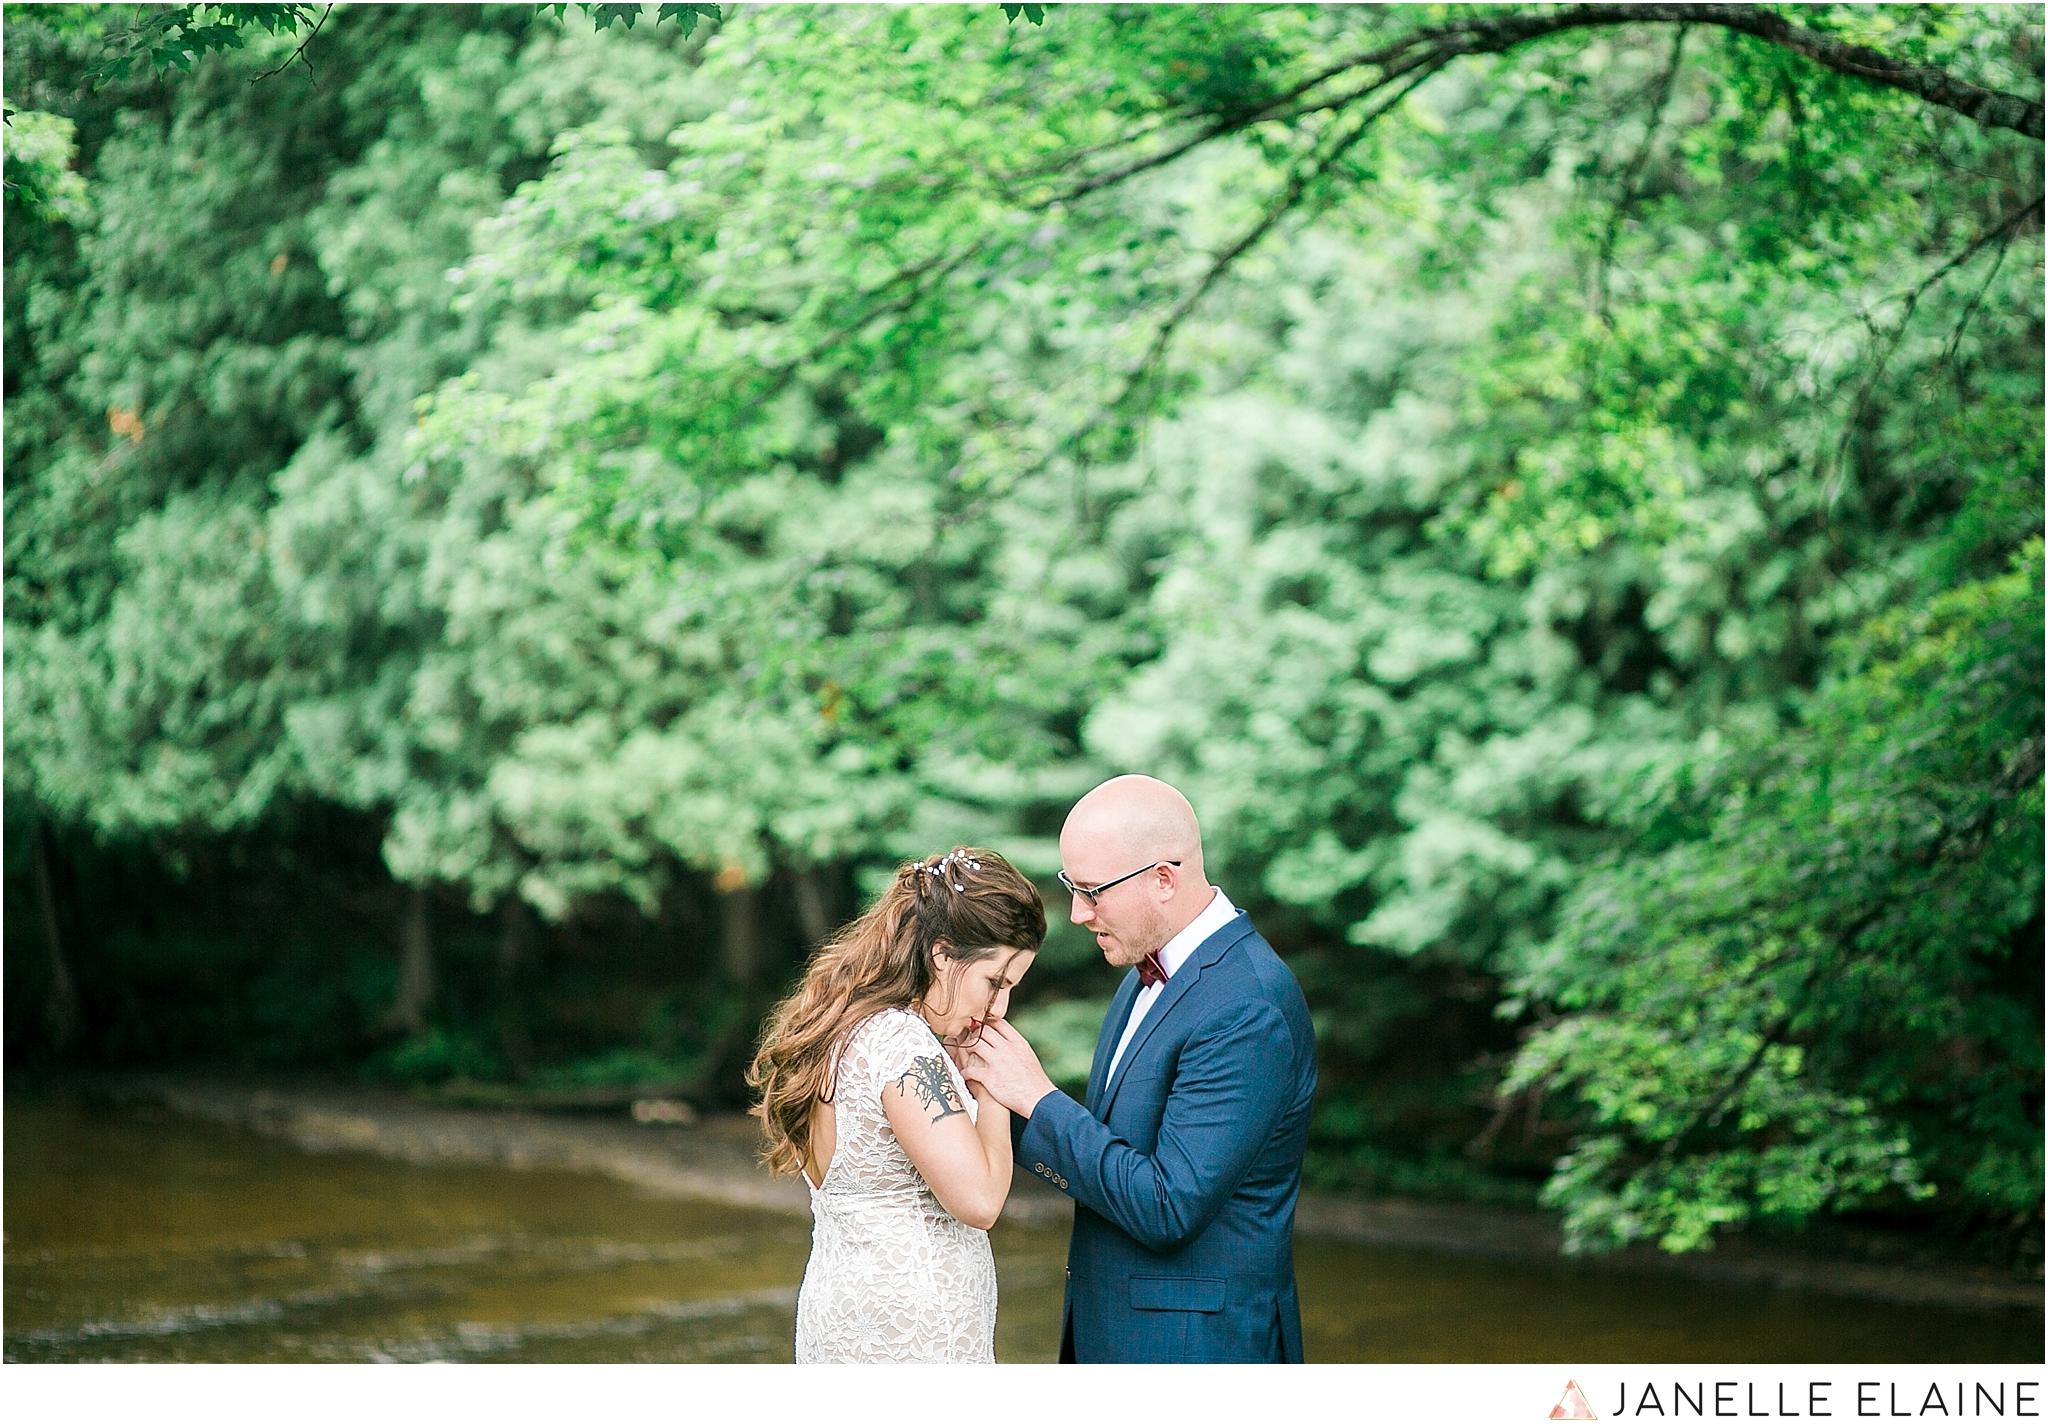 janelle elaine photography-seattle-destination-wedding-photographer-22.jpg